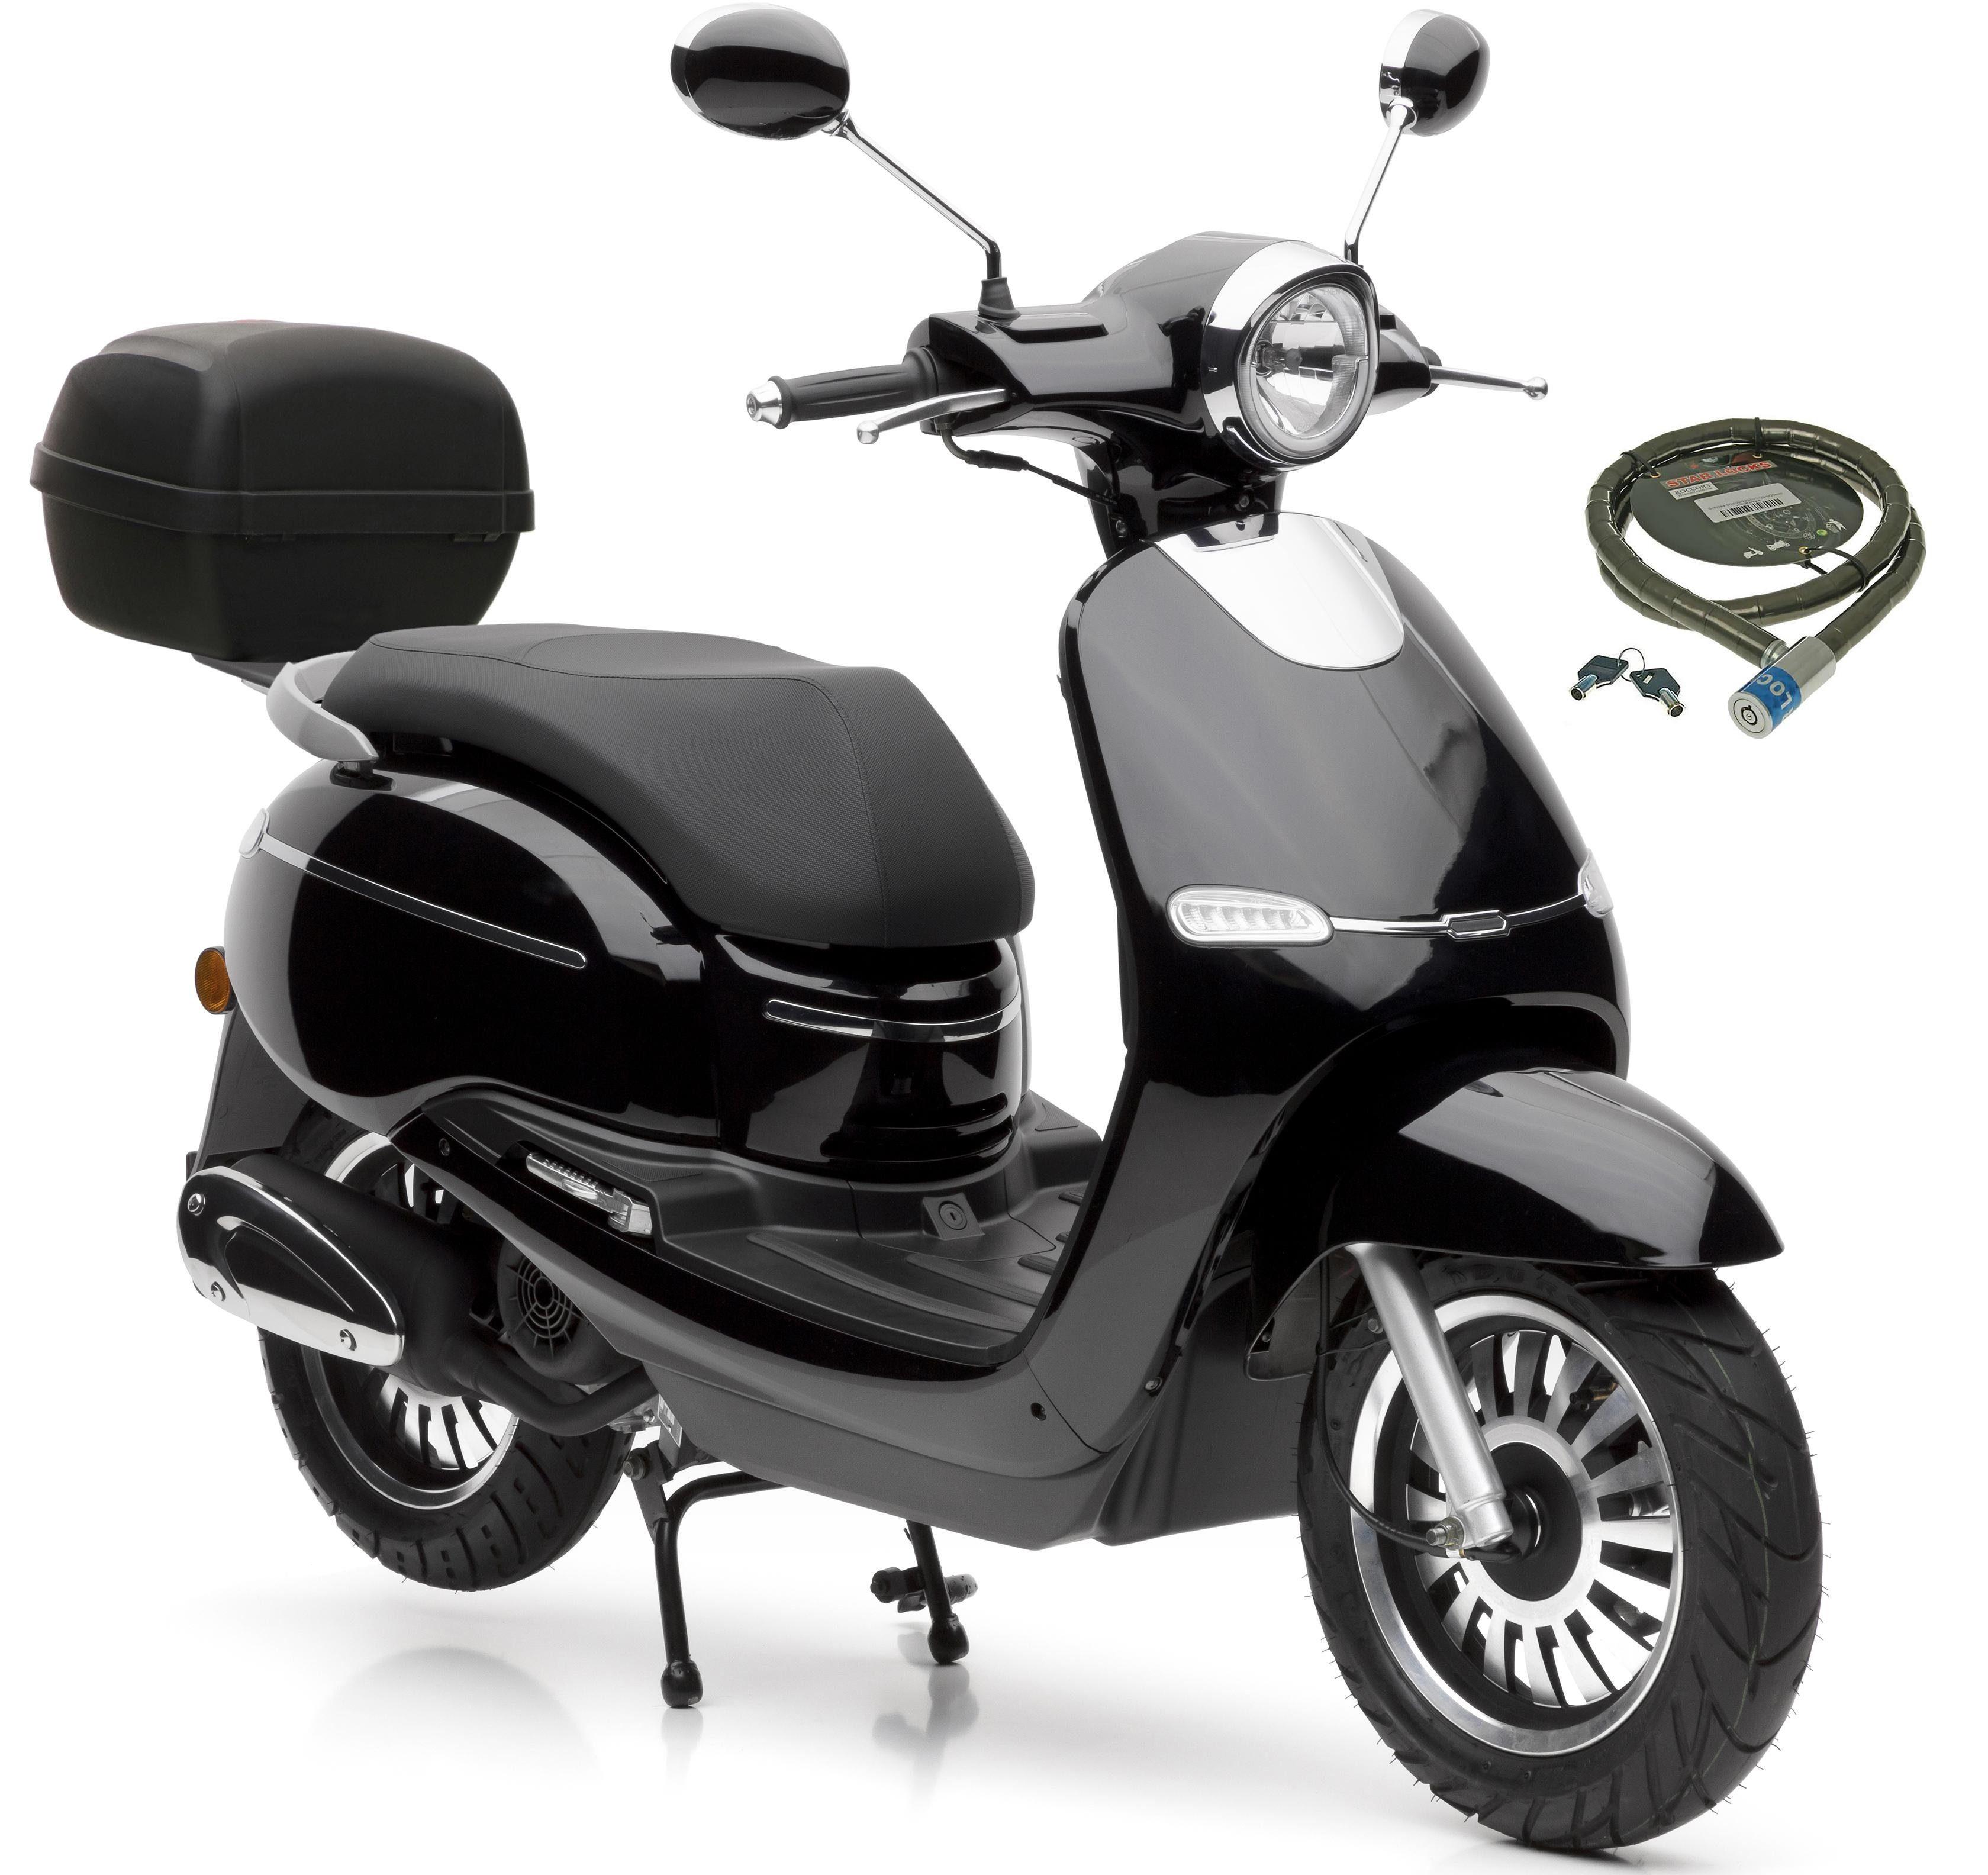 Nova Motors Motorroller »F10«, 49 ccm, 45 km/h, Euro 4, (Set, mit Topcase), inkl. Topcase, 49 ccm, 45 km/h